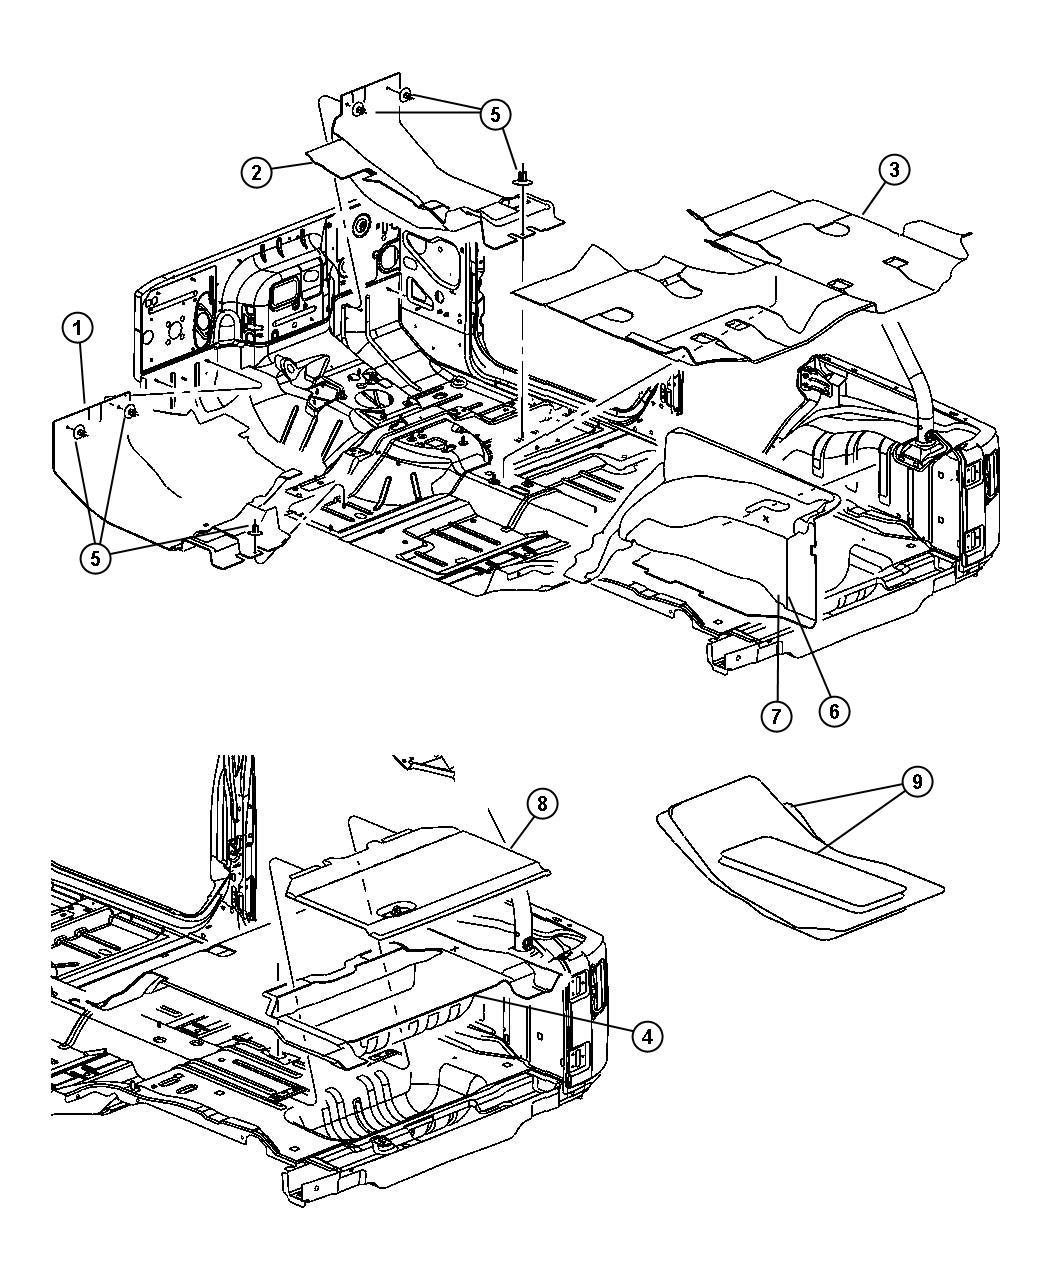 Jeep Wrangler Carpet Cargo Floor Rear Seat